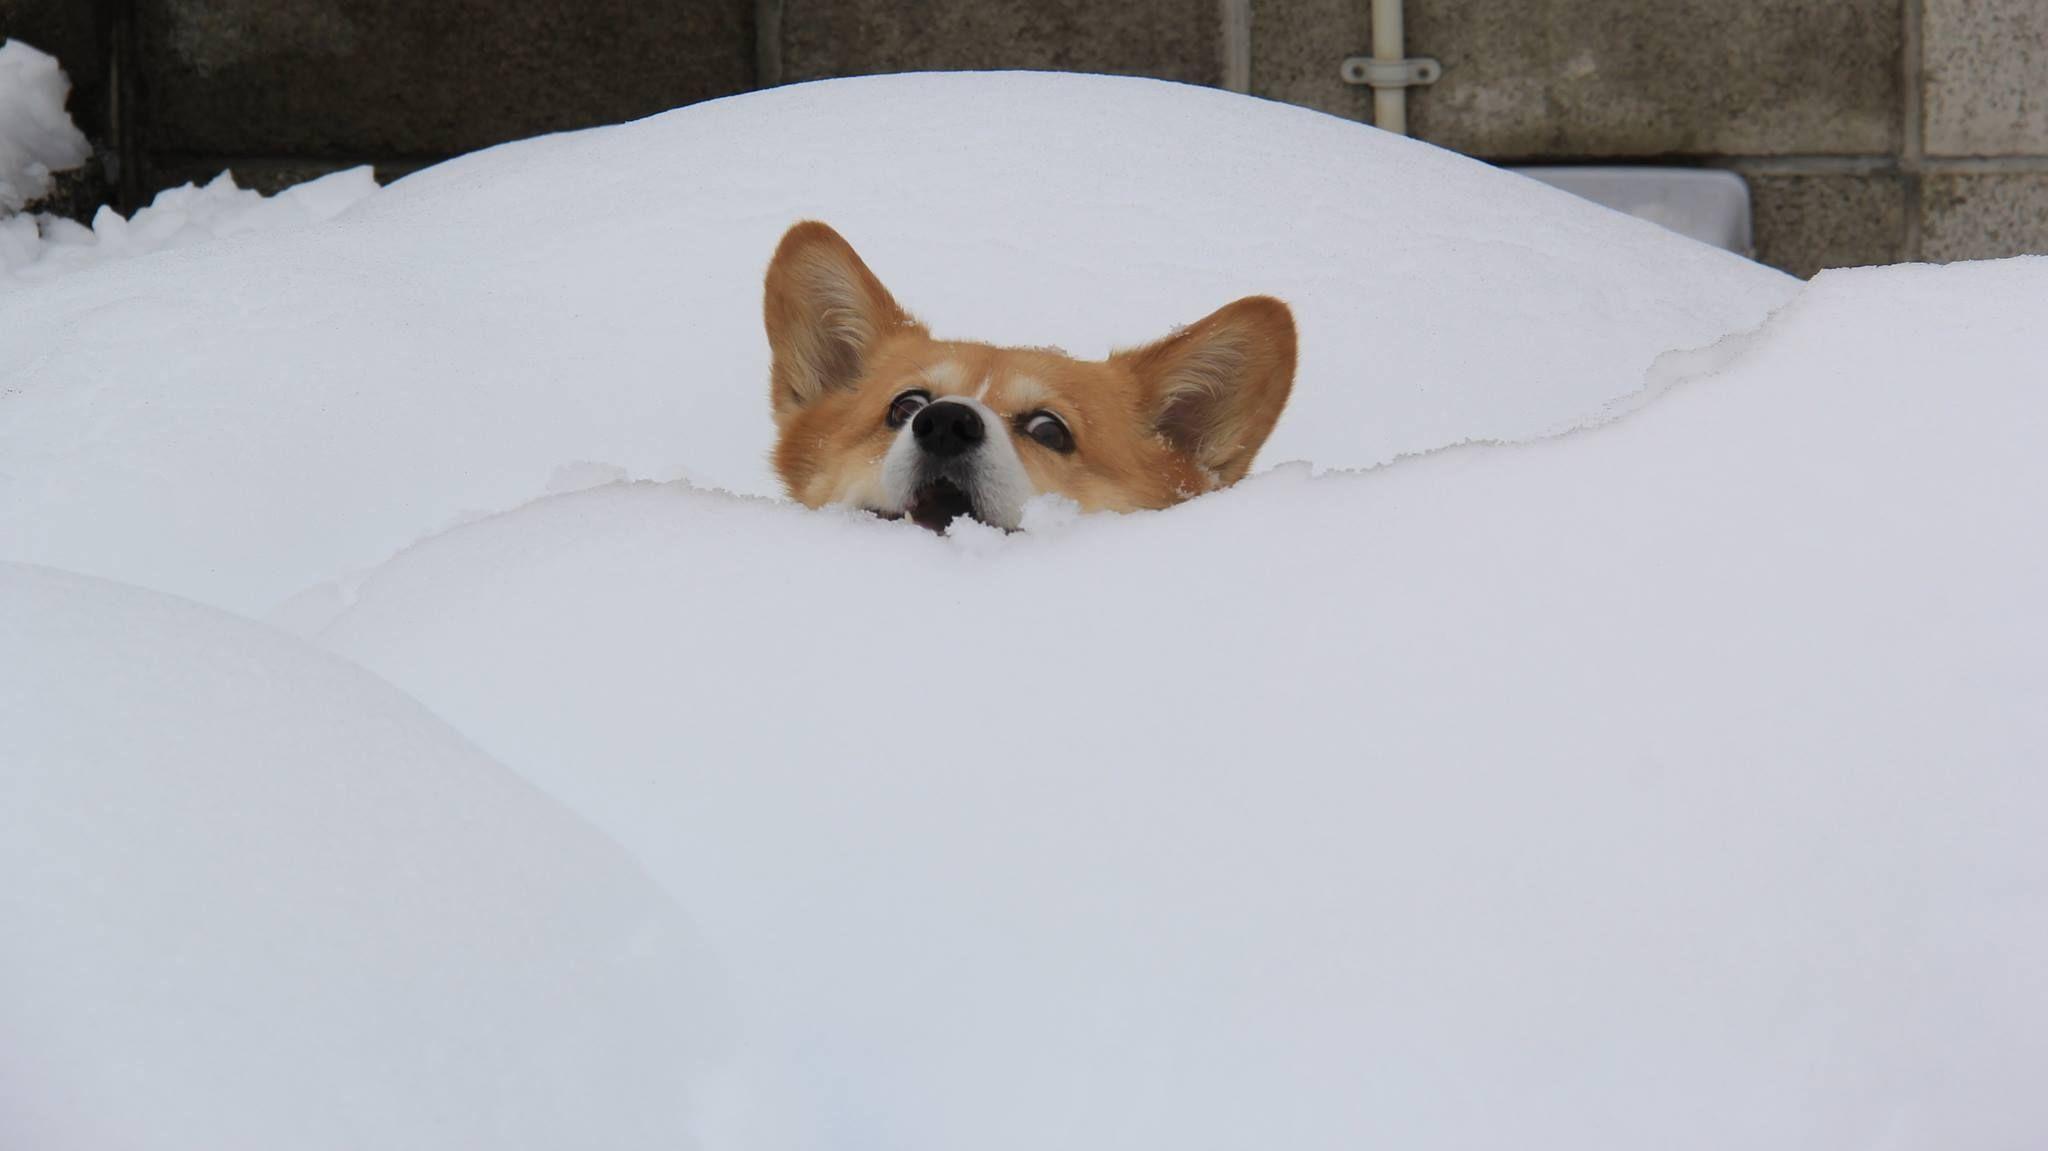 64869-Dog-In-The-Snow.jpg